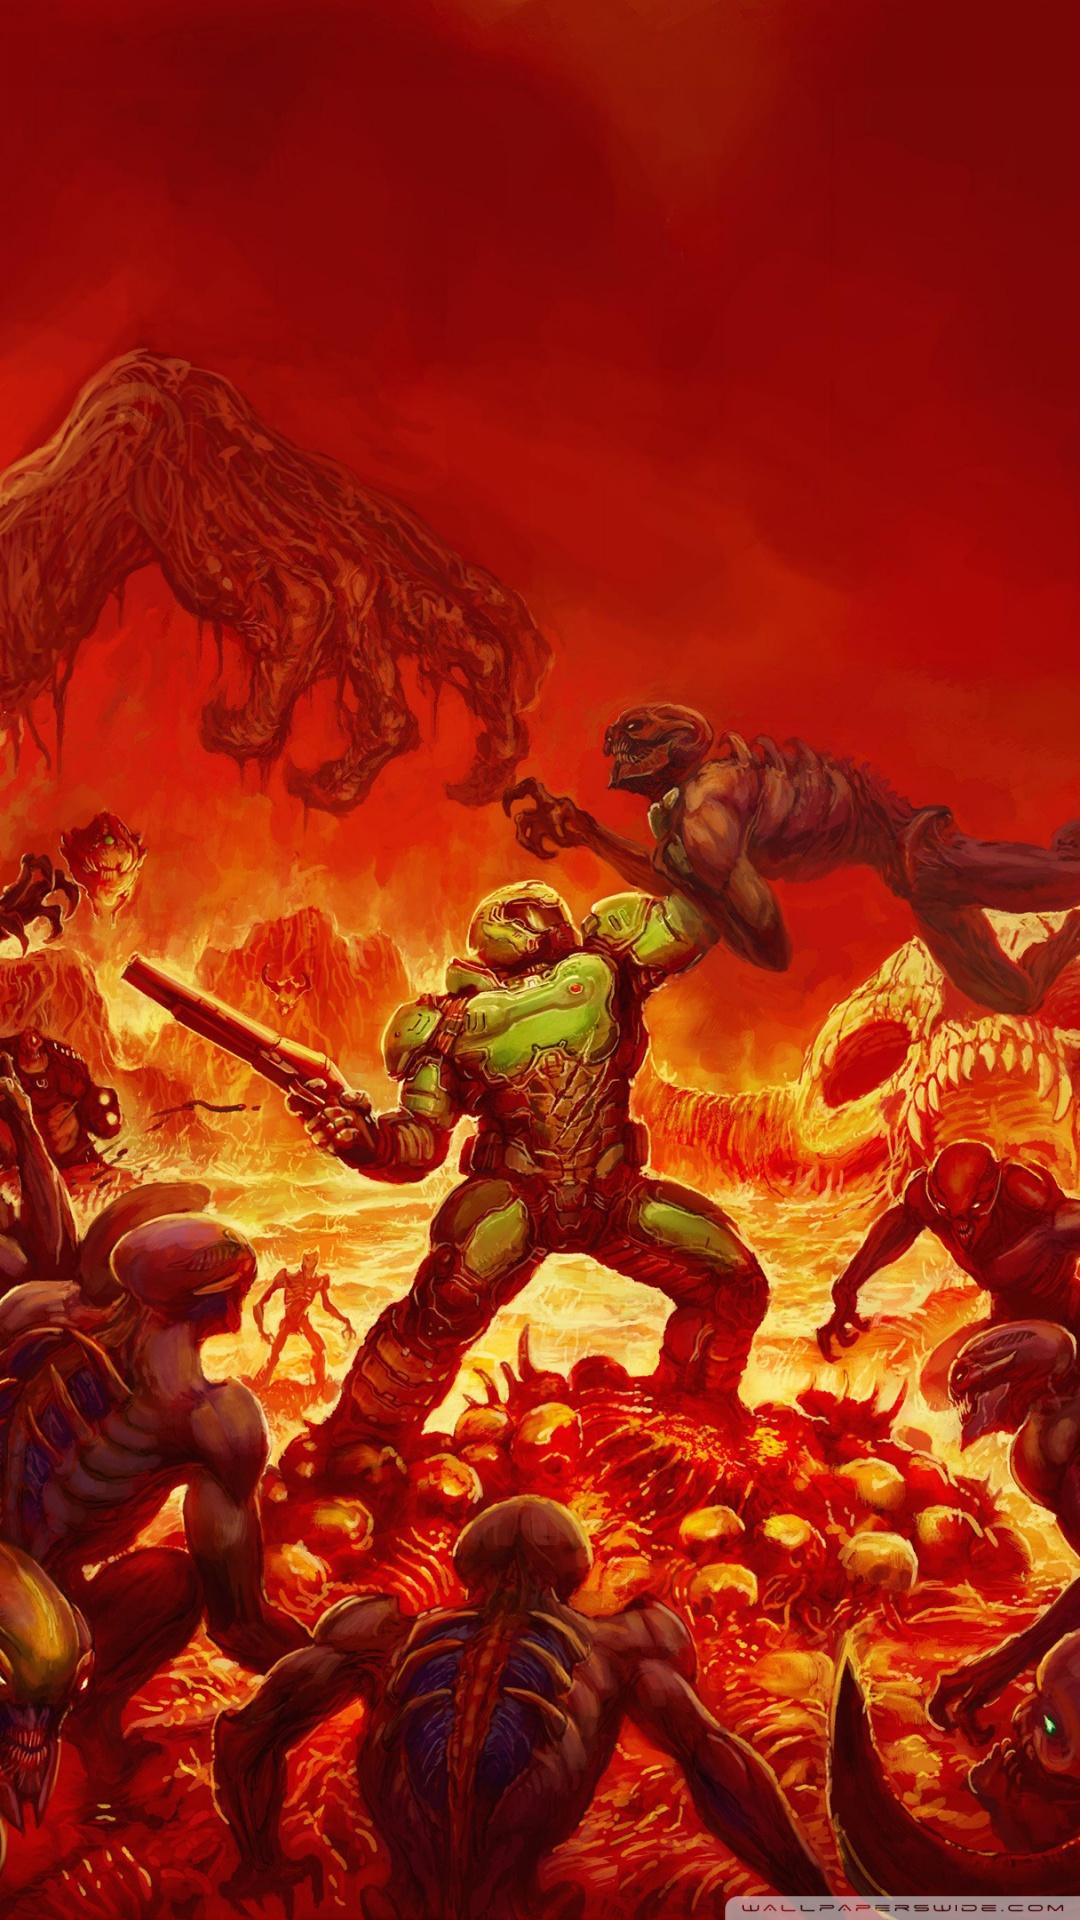 World Of Warcraft Wallpapers Hd Doom 2016 Video Game Hell 4k Hd Desktop Wallpaper For